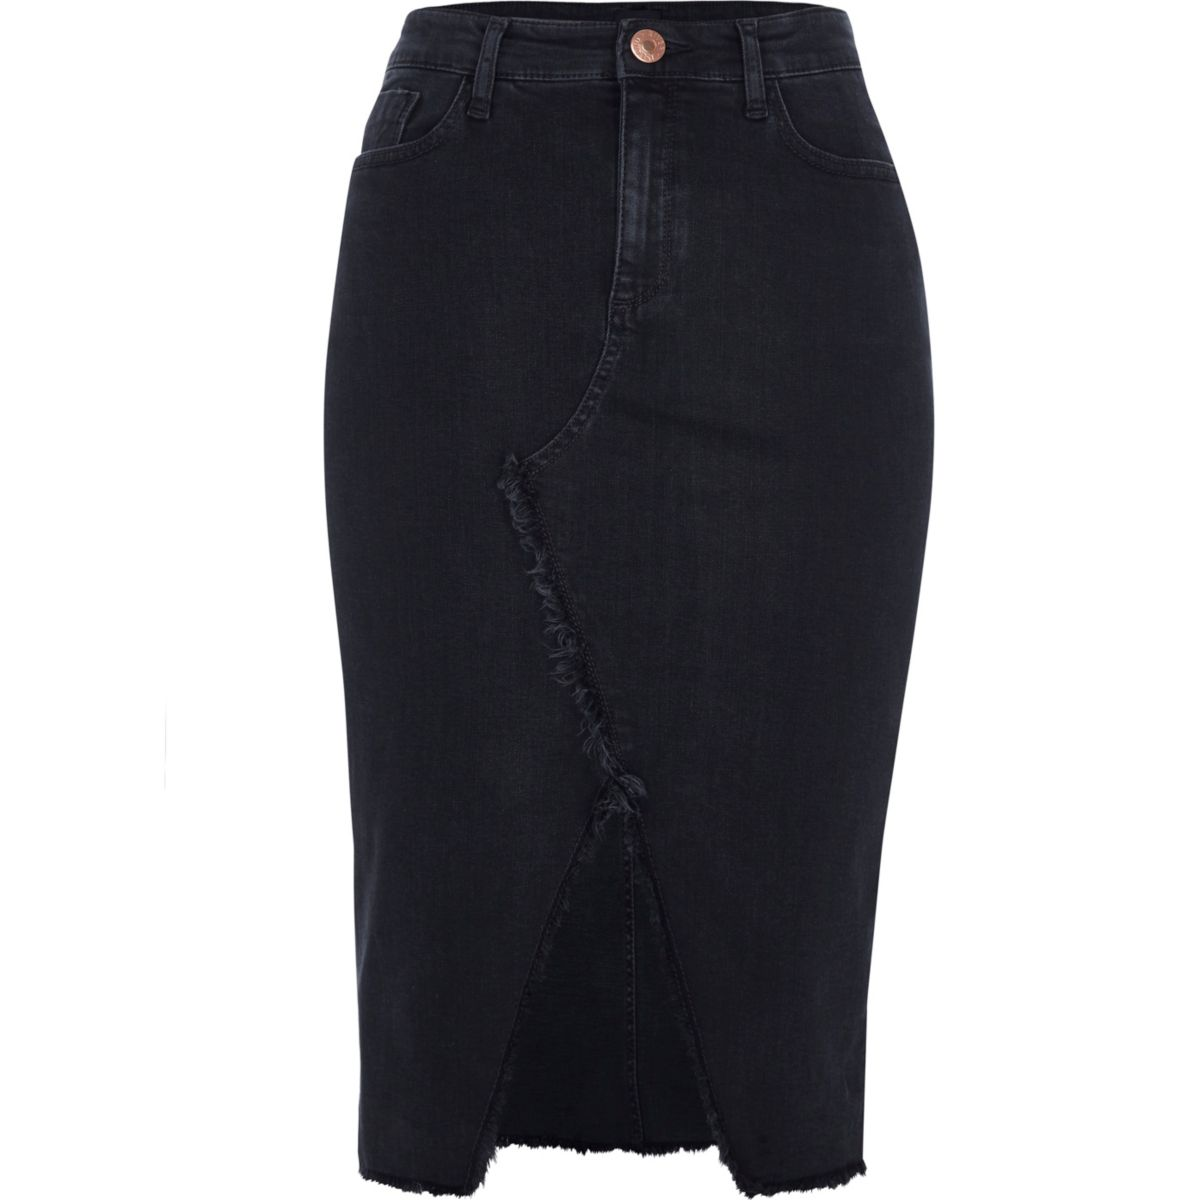 Black frayed split denim pencil skirt